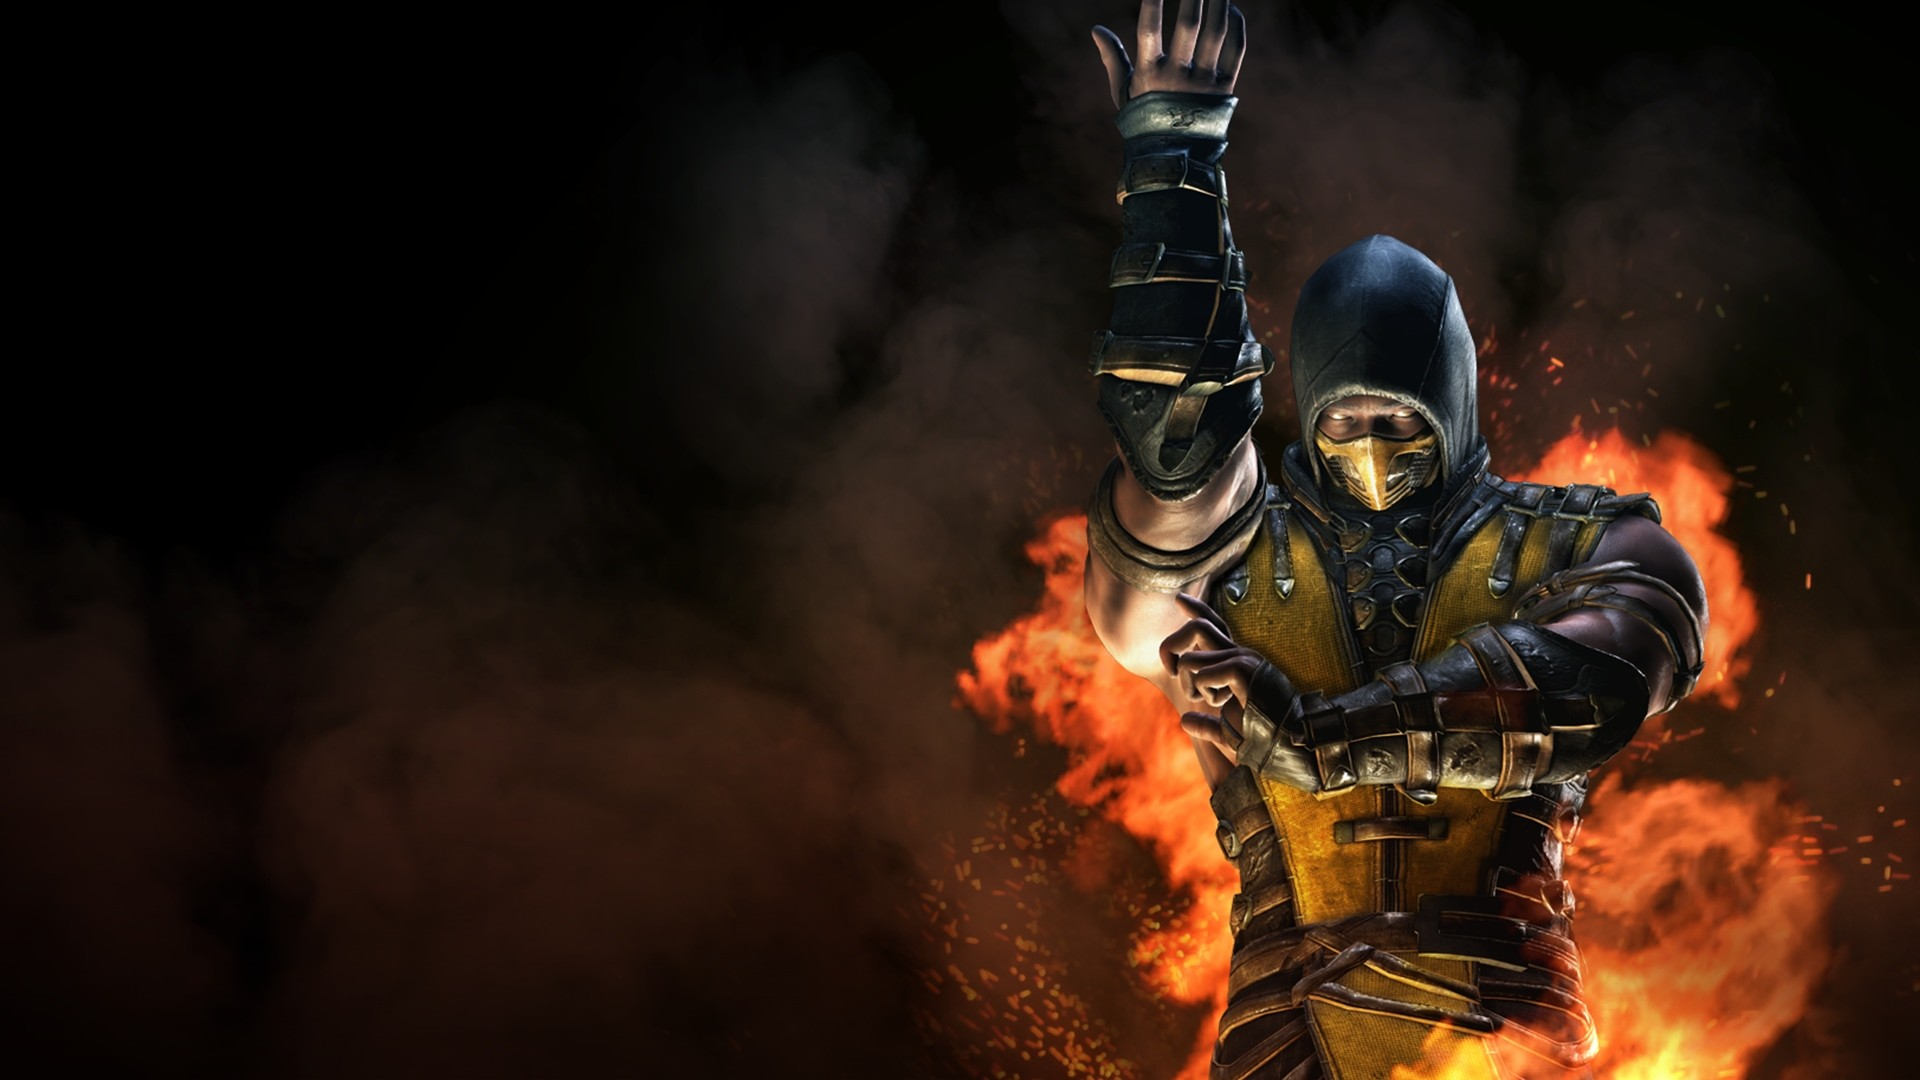 Mortal Kombat HD Wallpaper Background